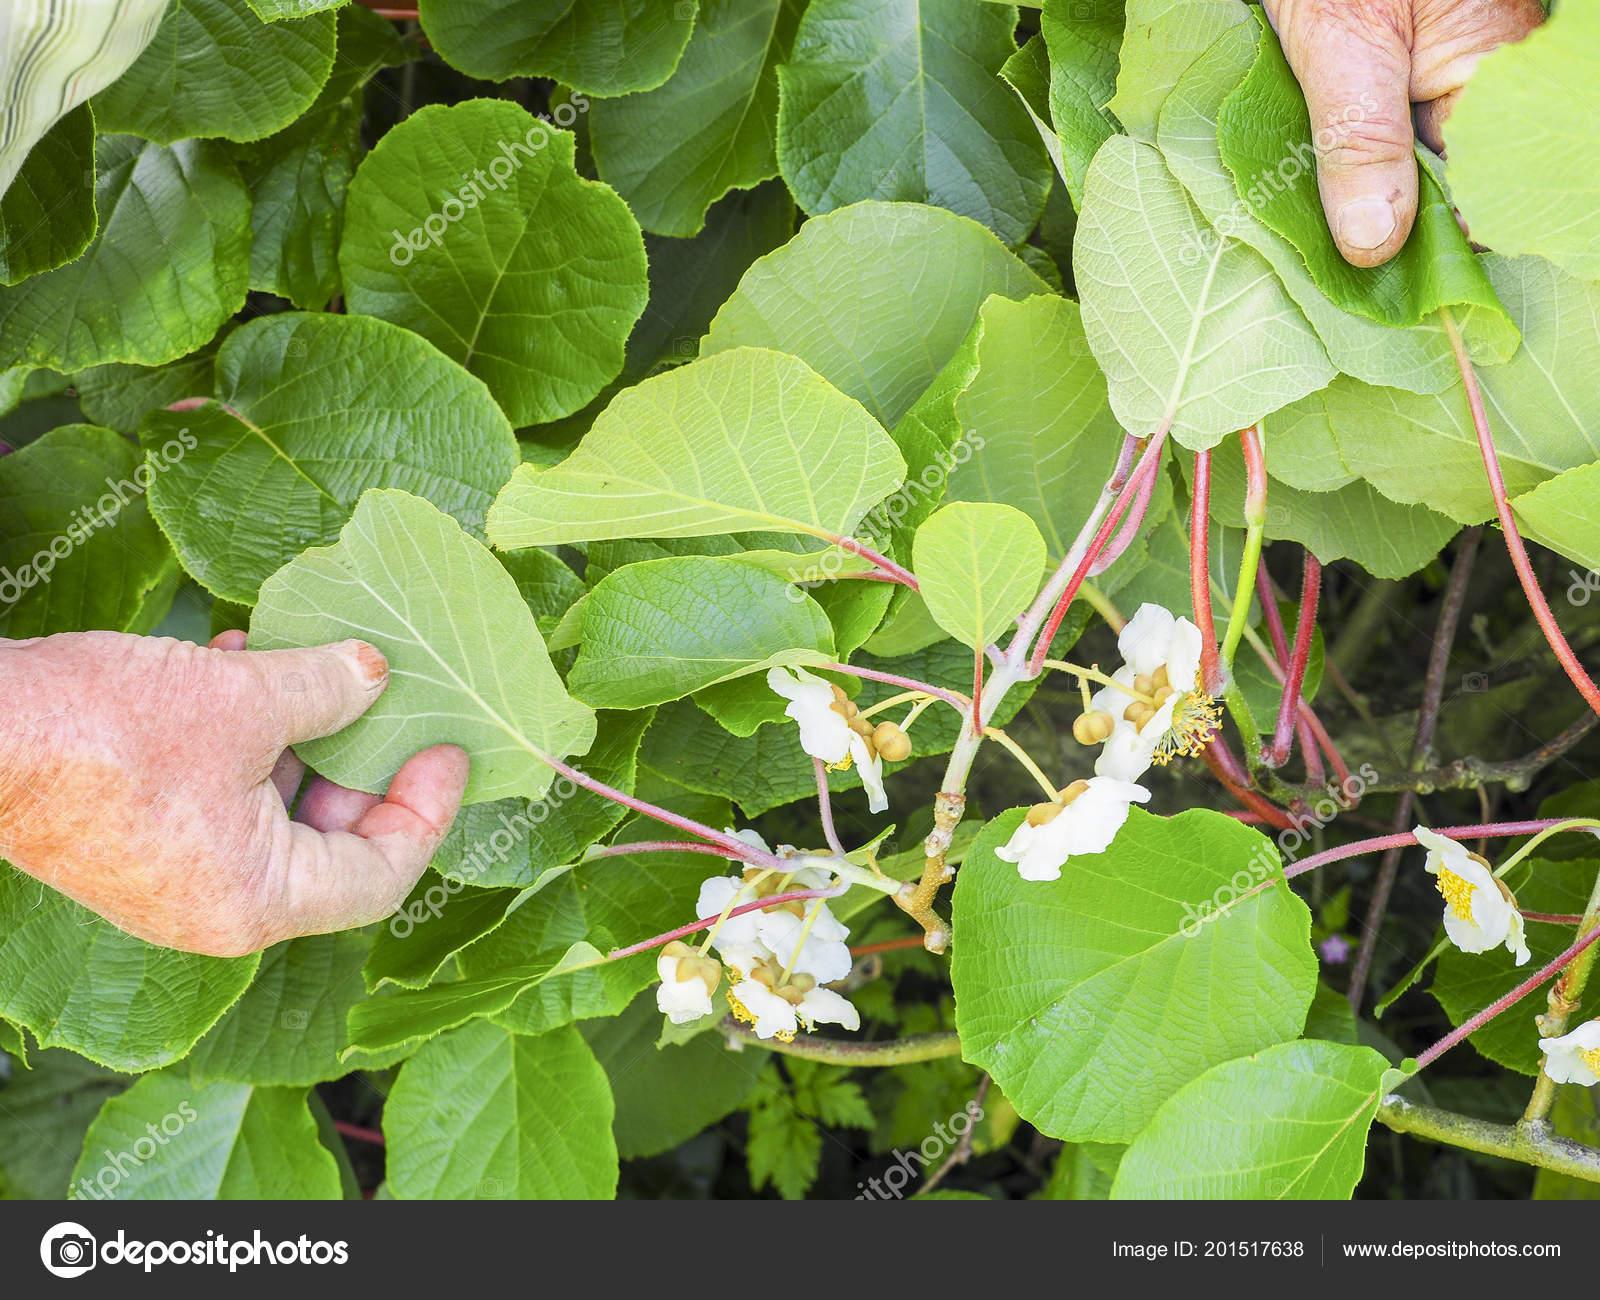 arbre fleurs fruits kiwi dans main jardinier principal france